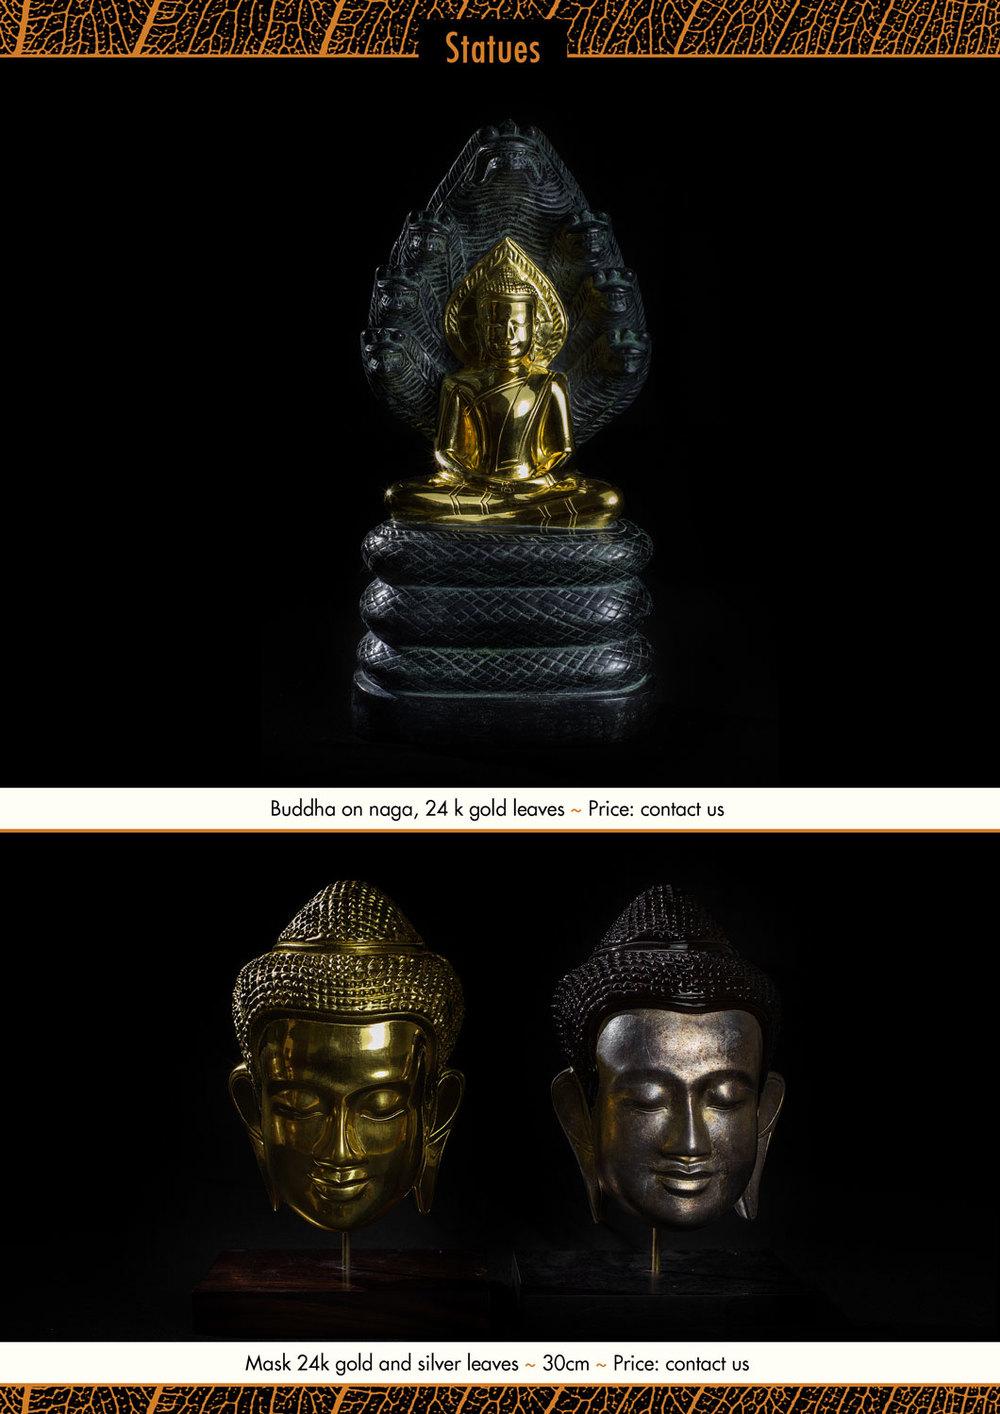 Statues-p1.jpg